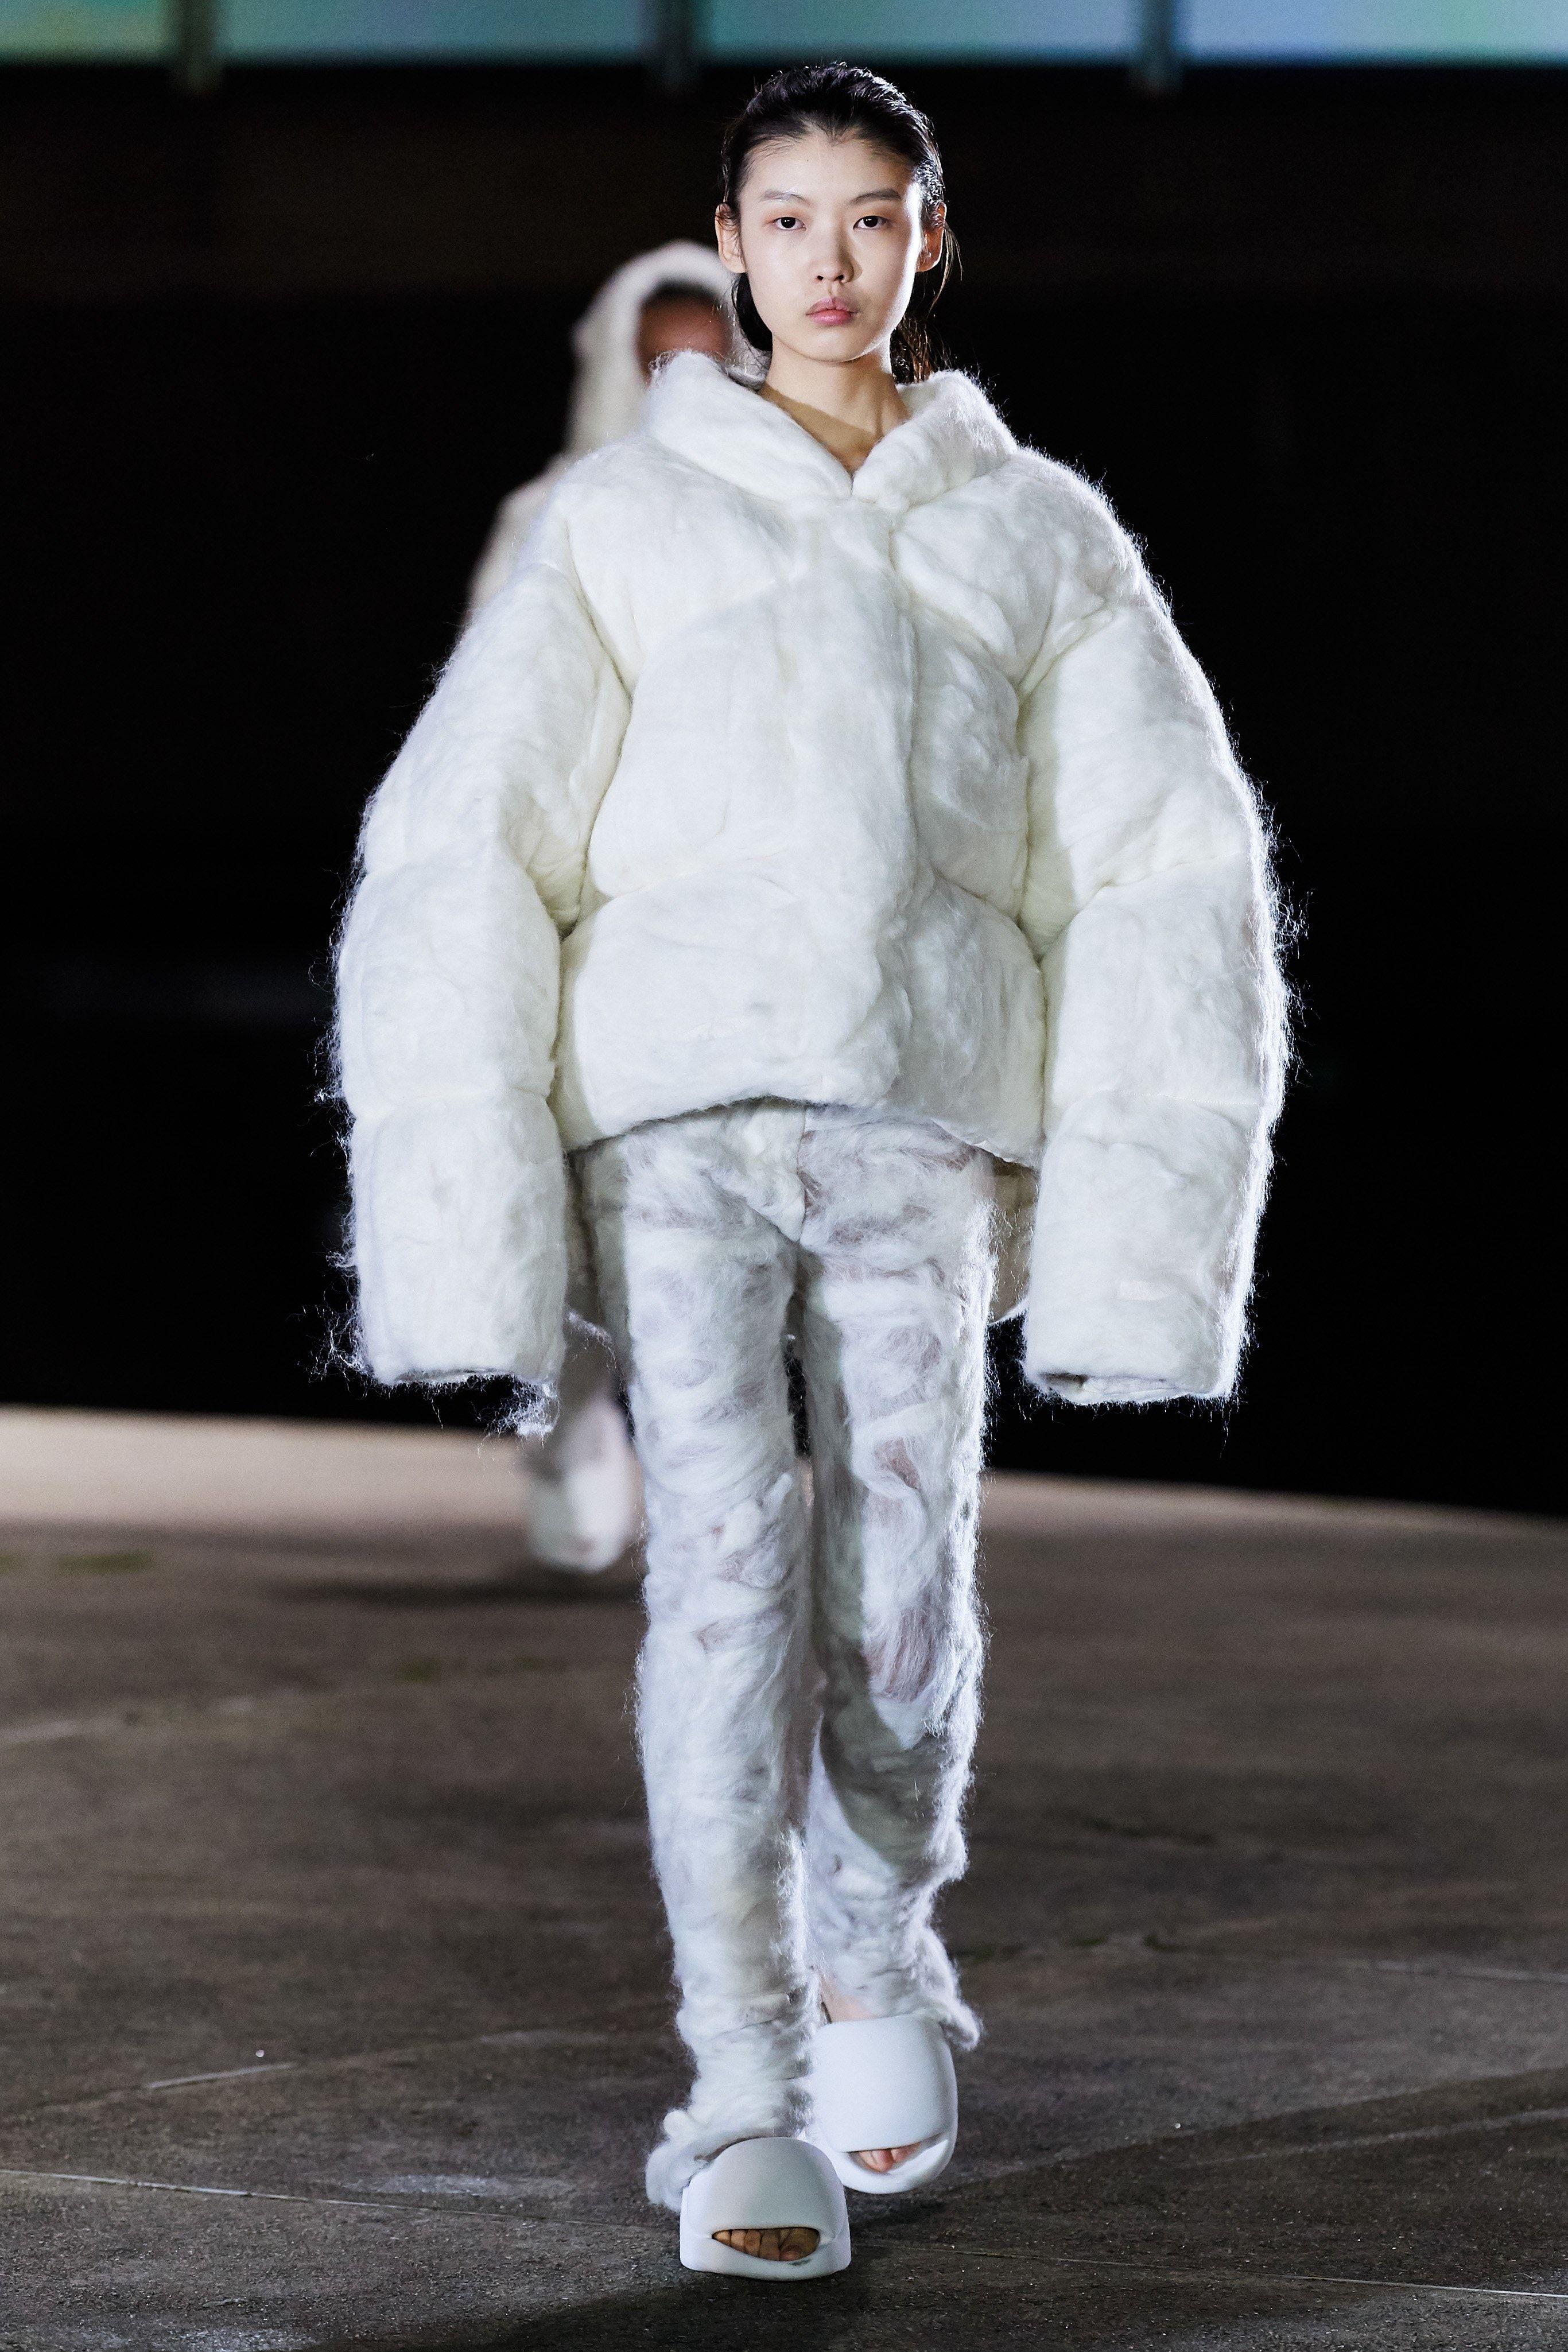 Yeezy Fall 2020 Ready To Wear Fashion Show In 2020 Yeezy Fashion Show Yeezy Yeezy By Kanye West